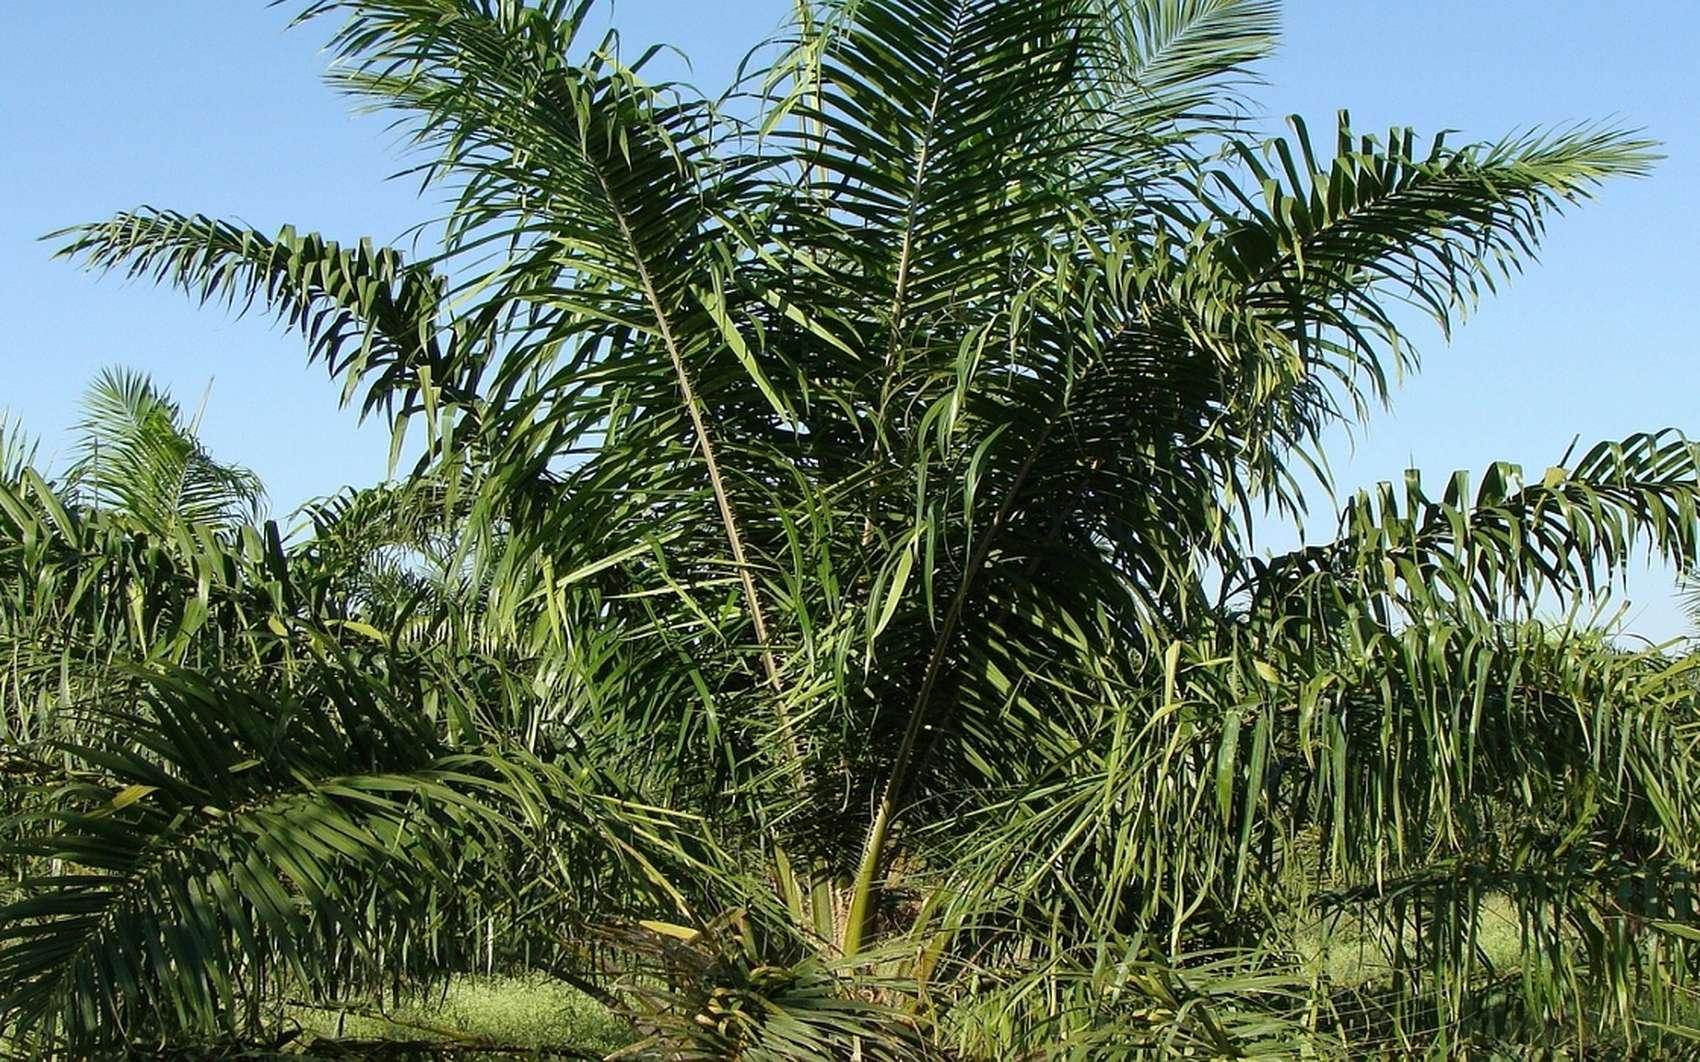 Les dangers de l'huile de palme. © sarangib, Pixabay